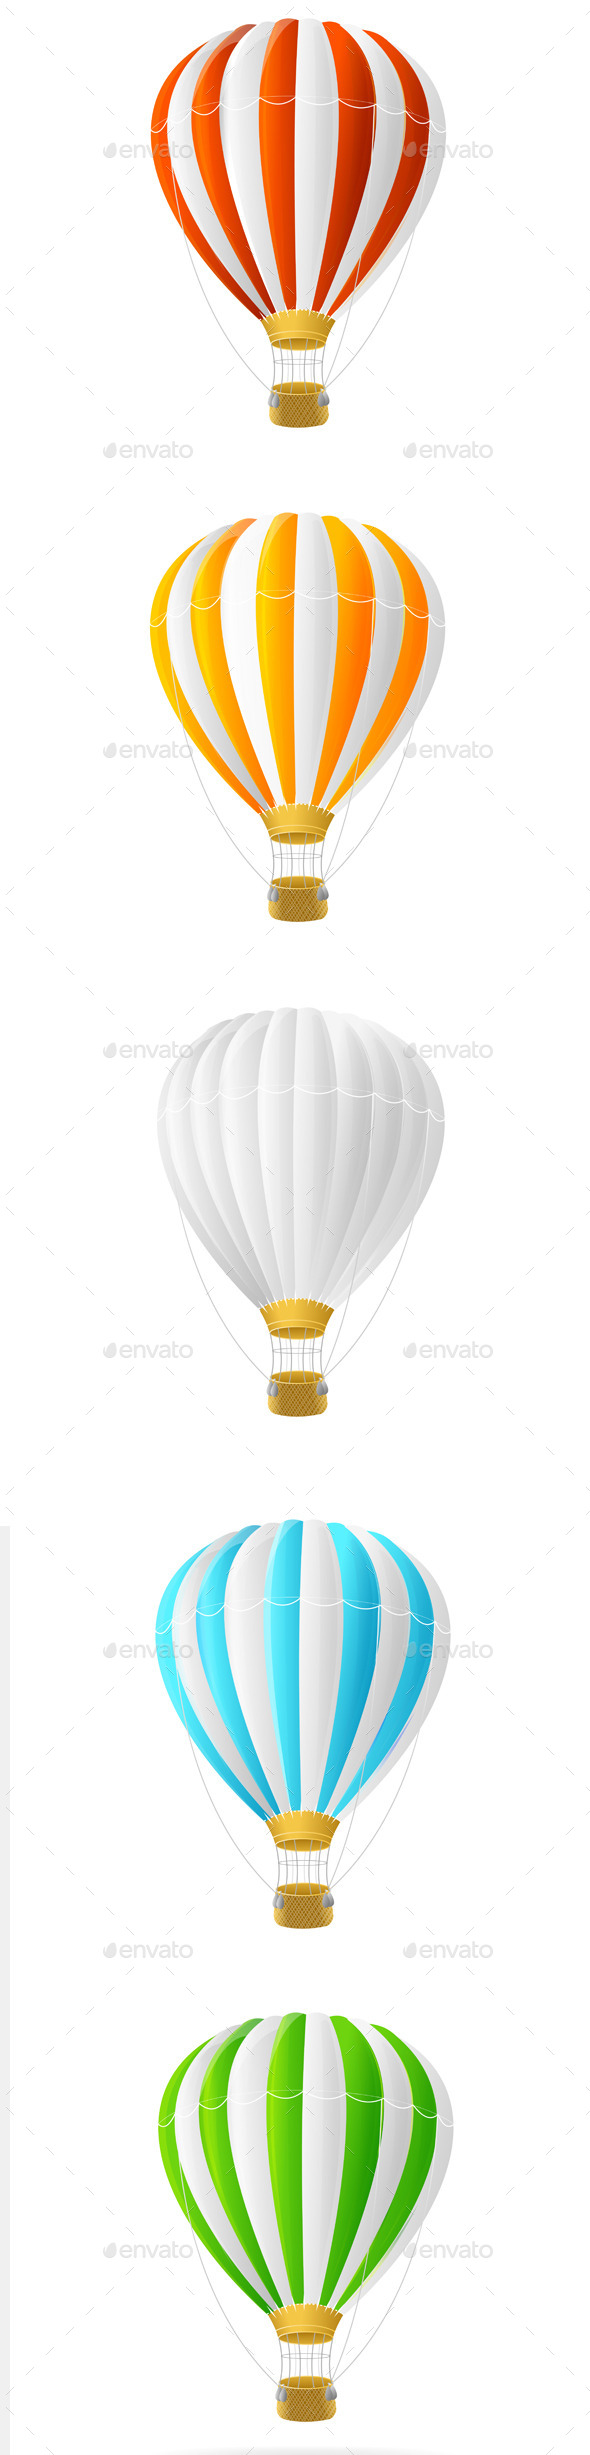 GraphicRiver Hot Air Balloon Set 11401529